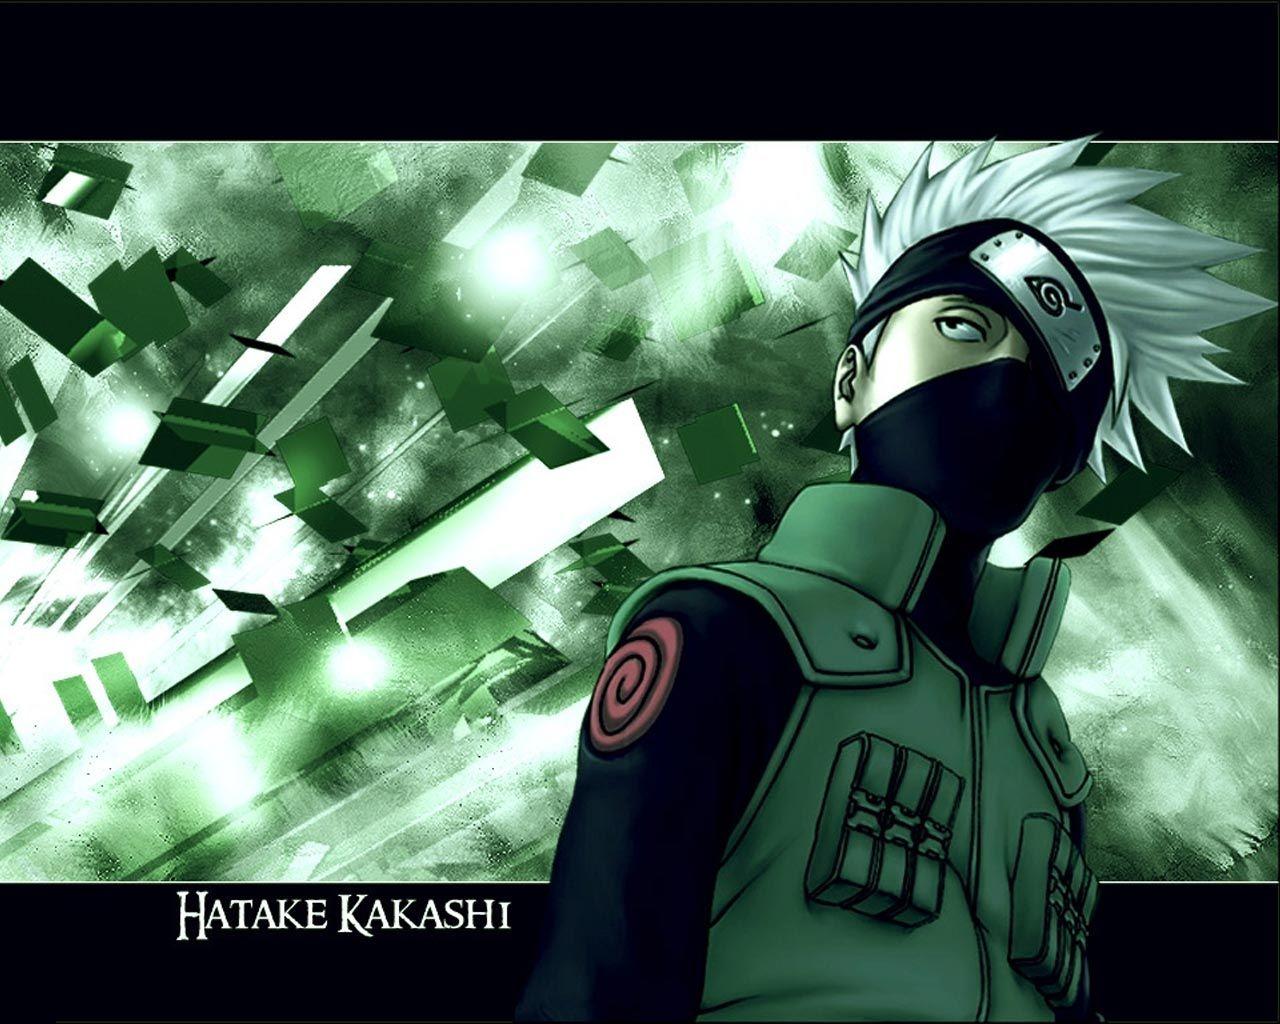 kakashi hatake hd wallpapers backgrounds wallpaper 1024×640